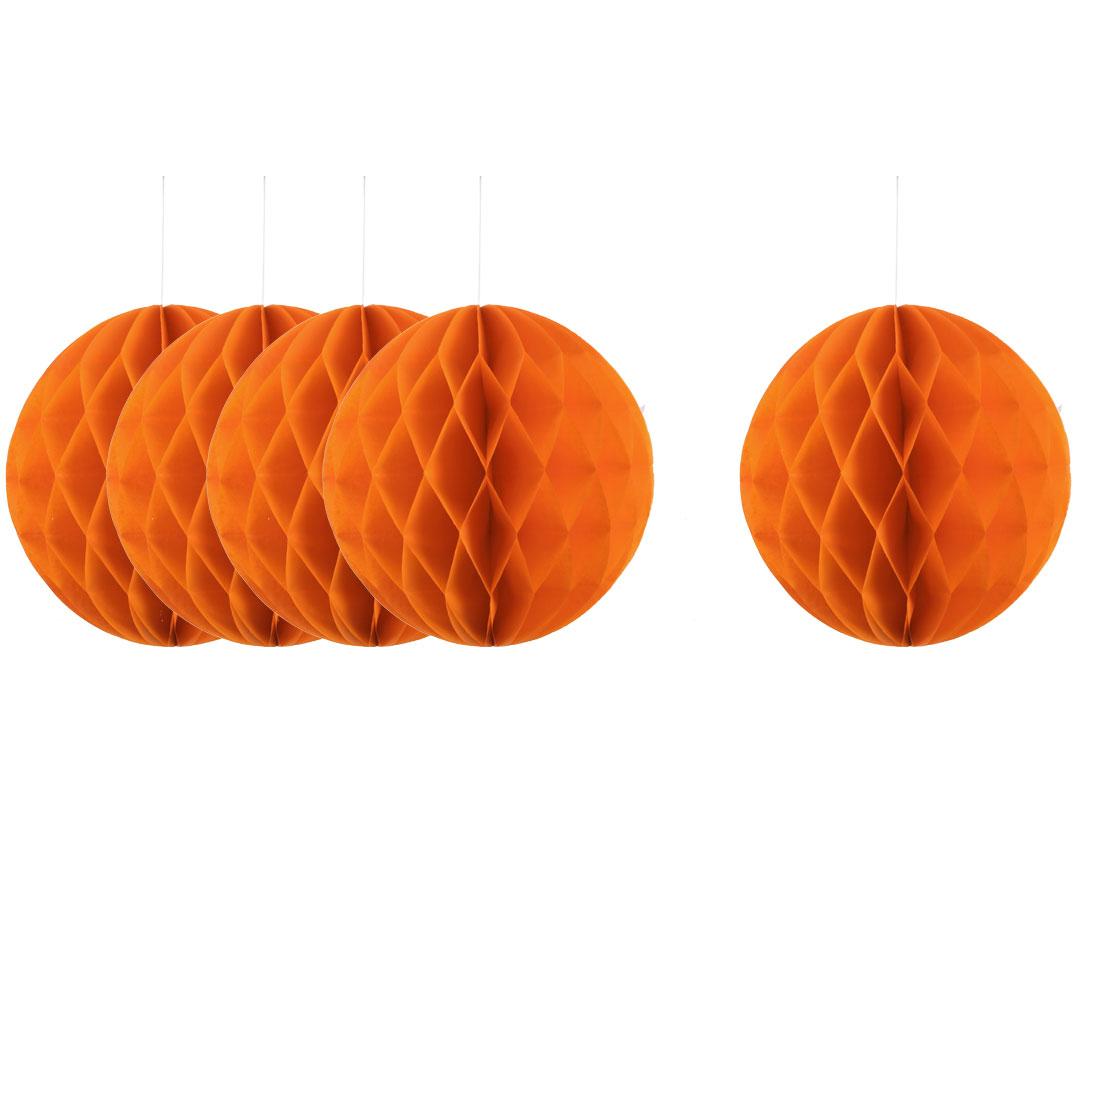 Home Hotel Paper Wall Window Door DIY Decoration Honeycomb Ball Orange 12 Inch Dia 5 Pcs